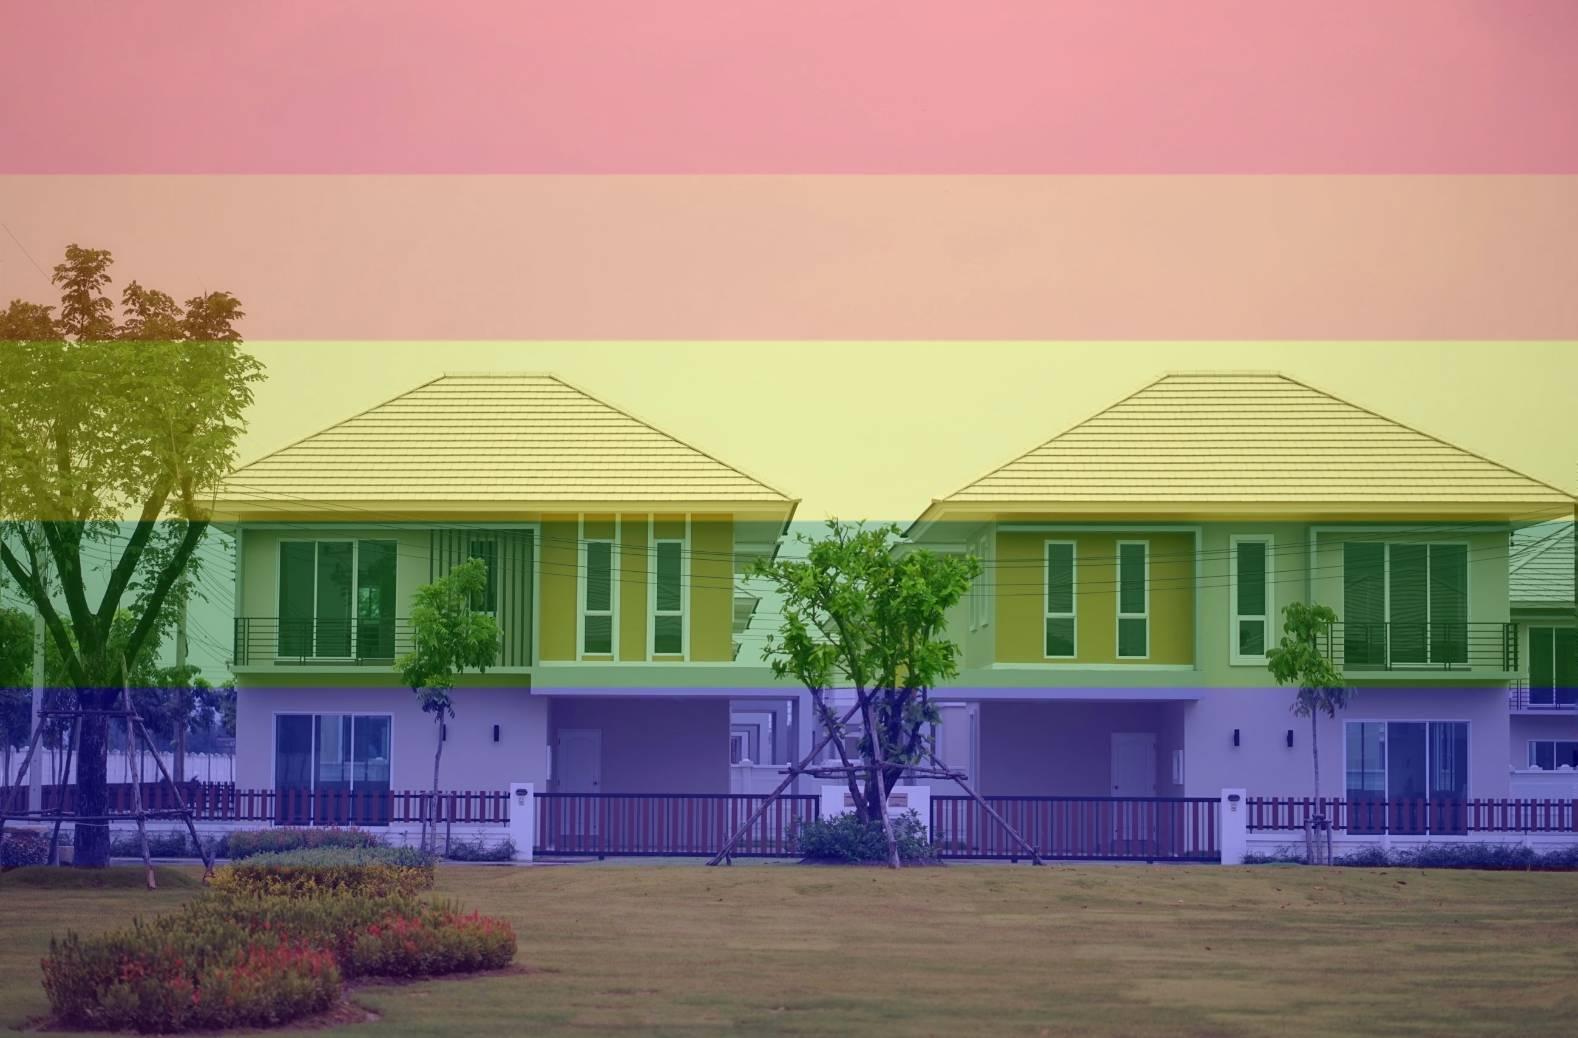 DDproperty_LGBTQ+ กู้ซื้อบ้าน